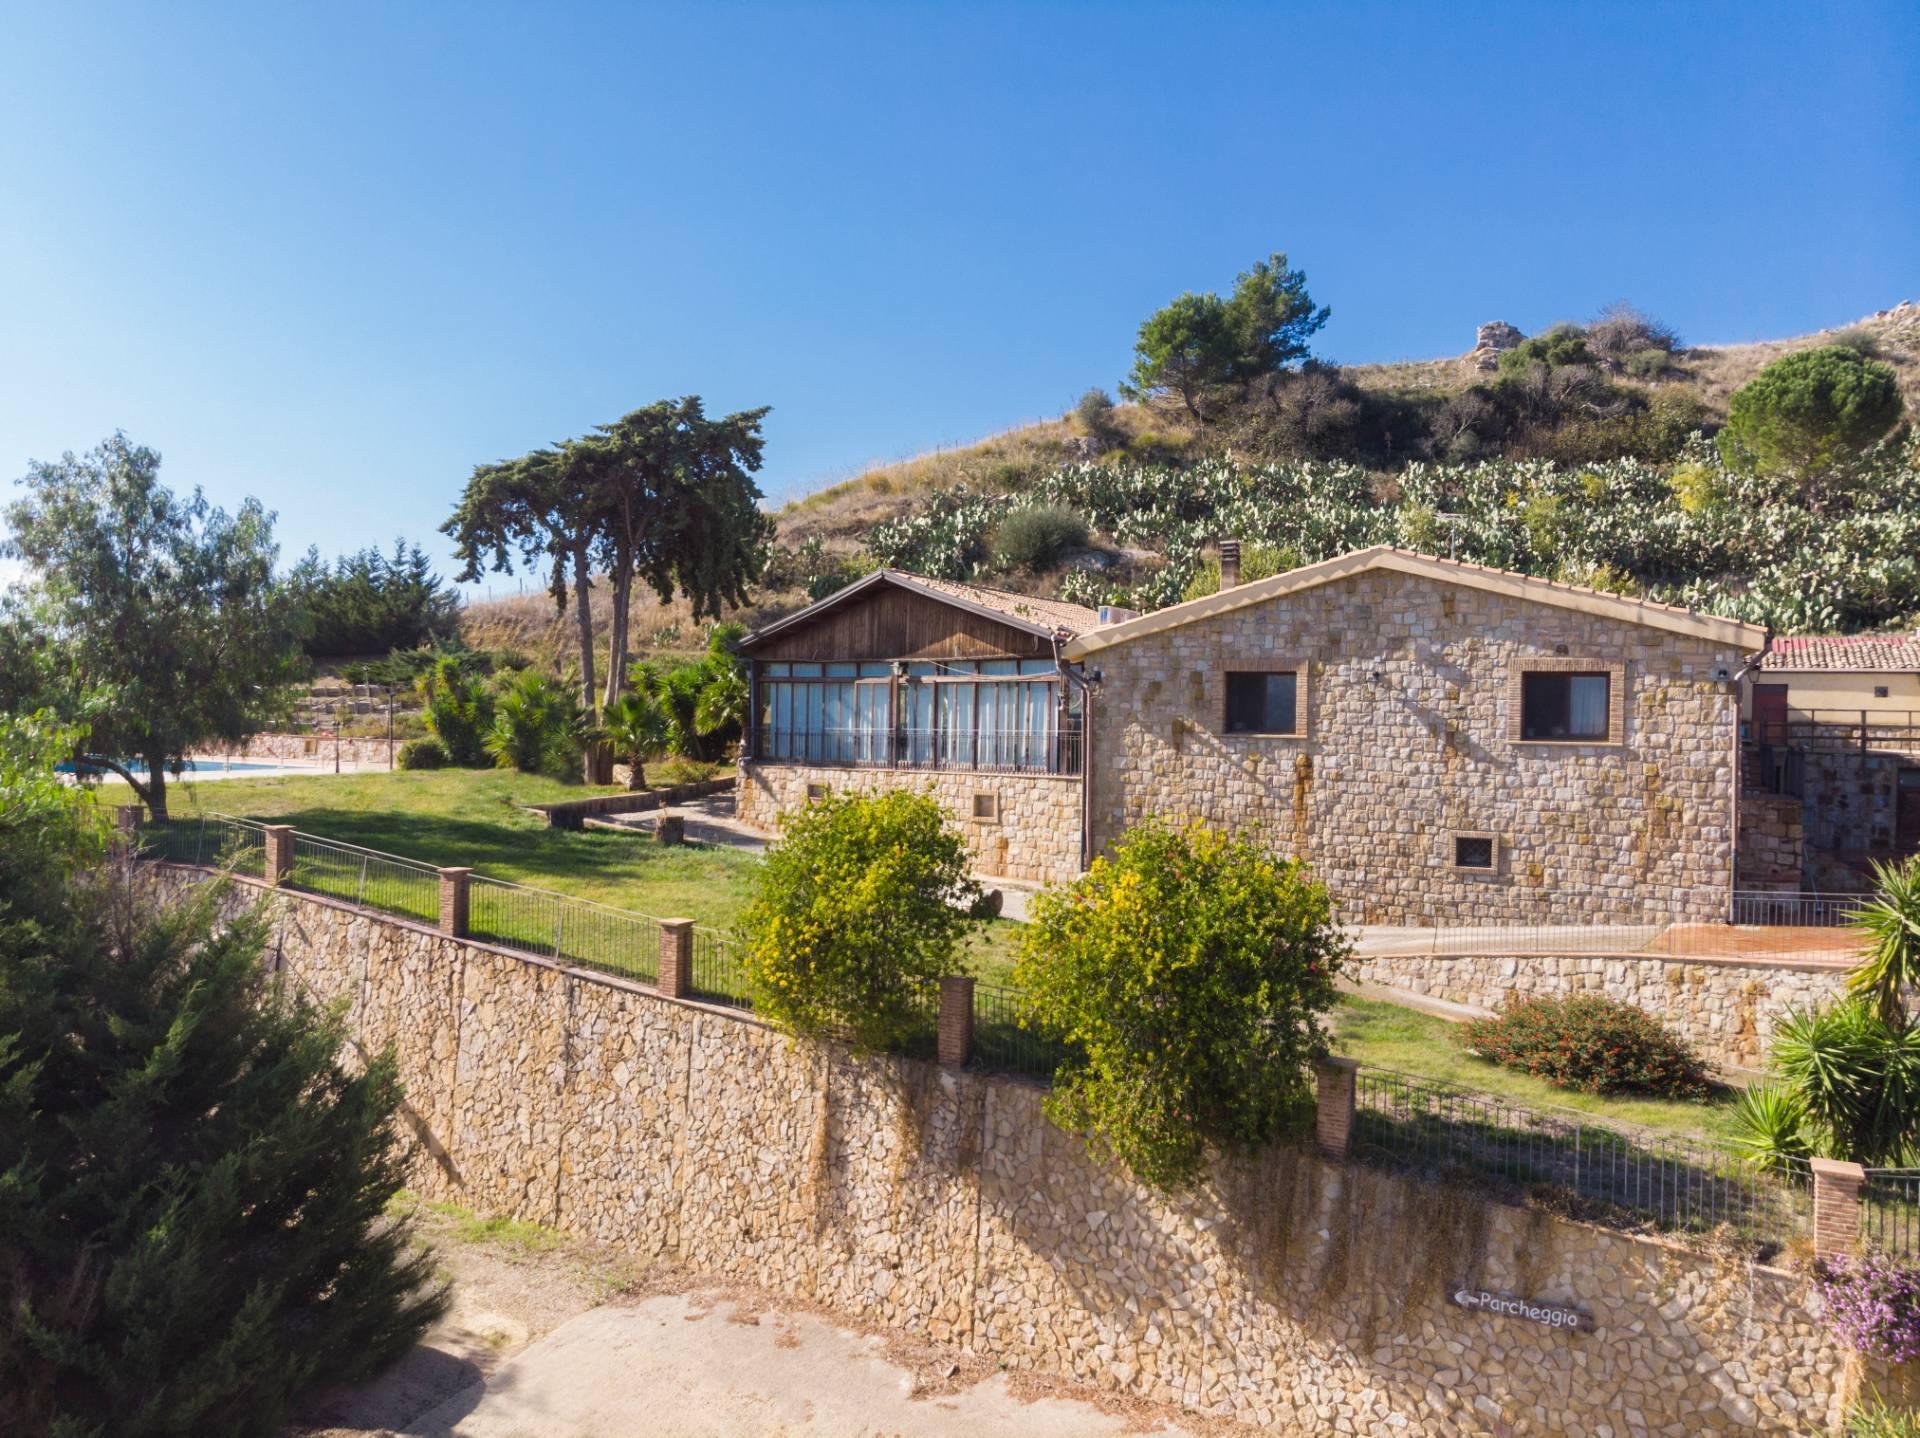 Farmhouse in the heart of Sicily - 6